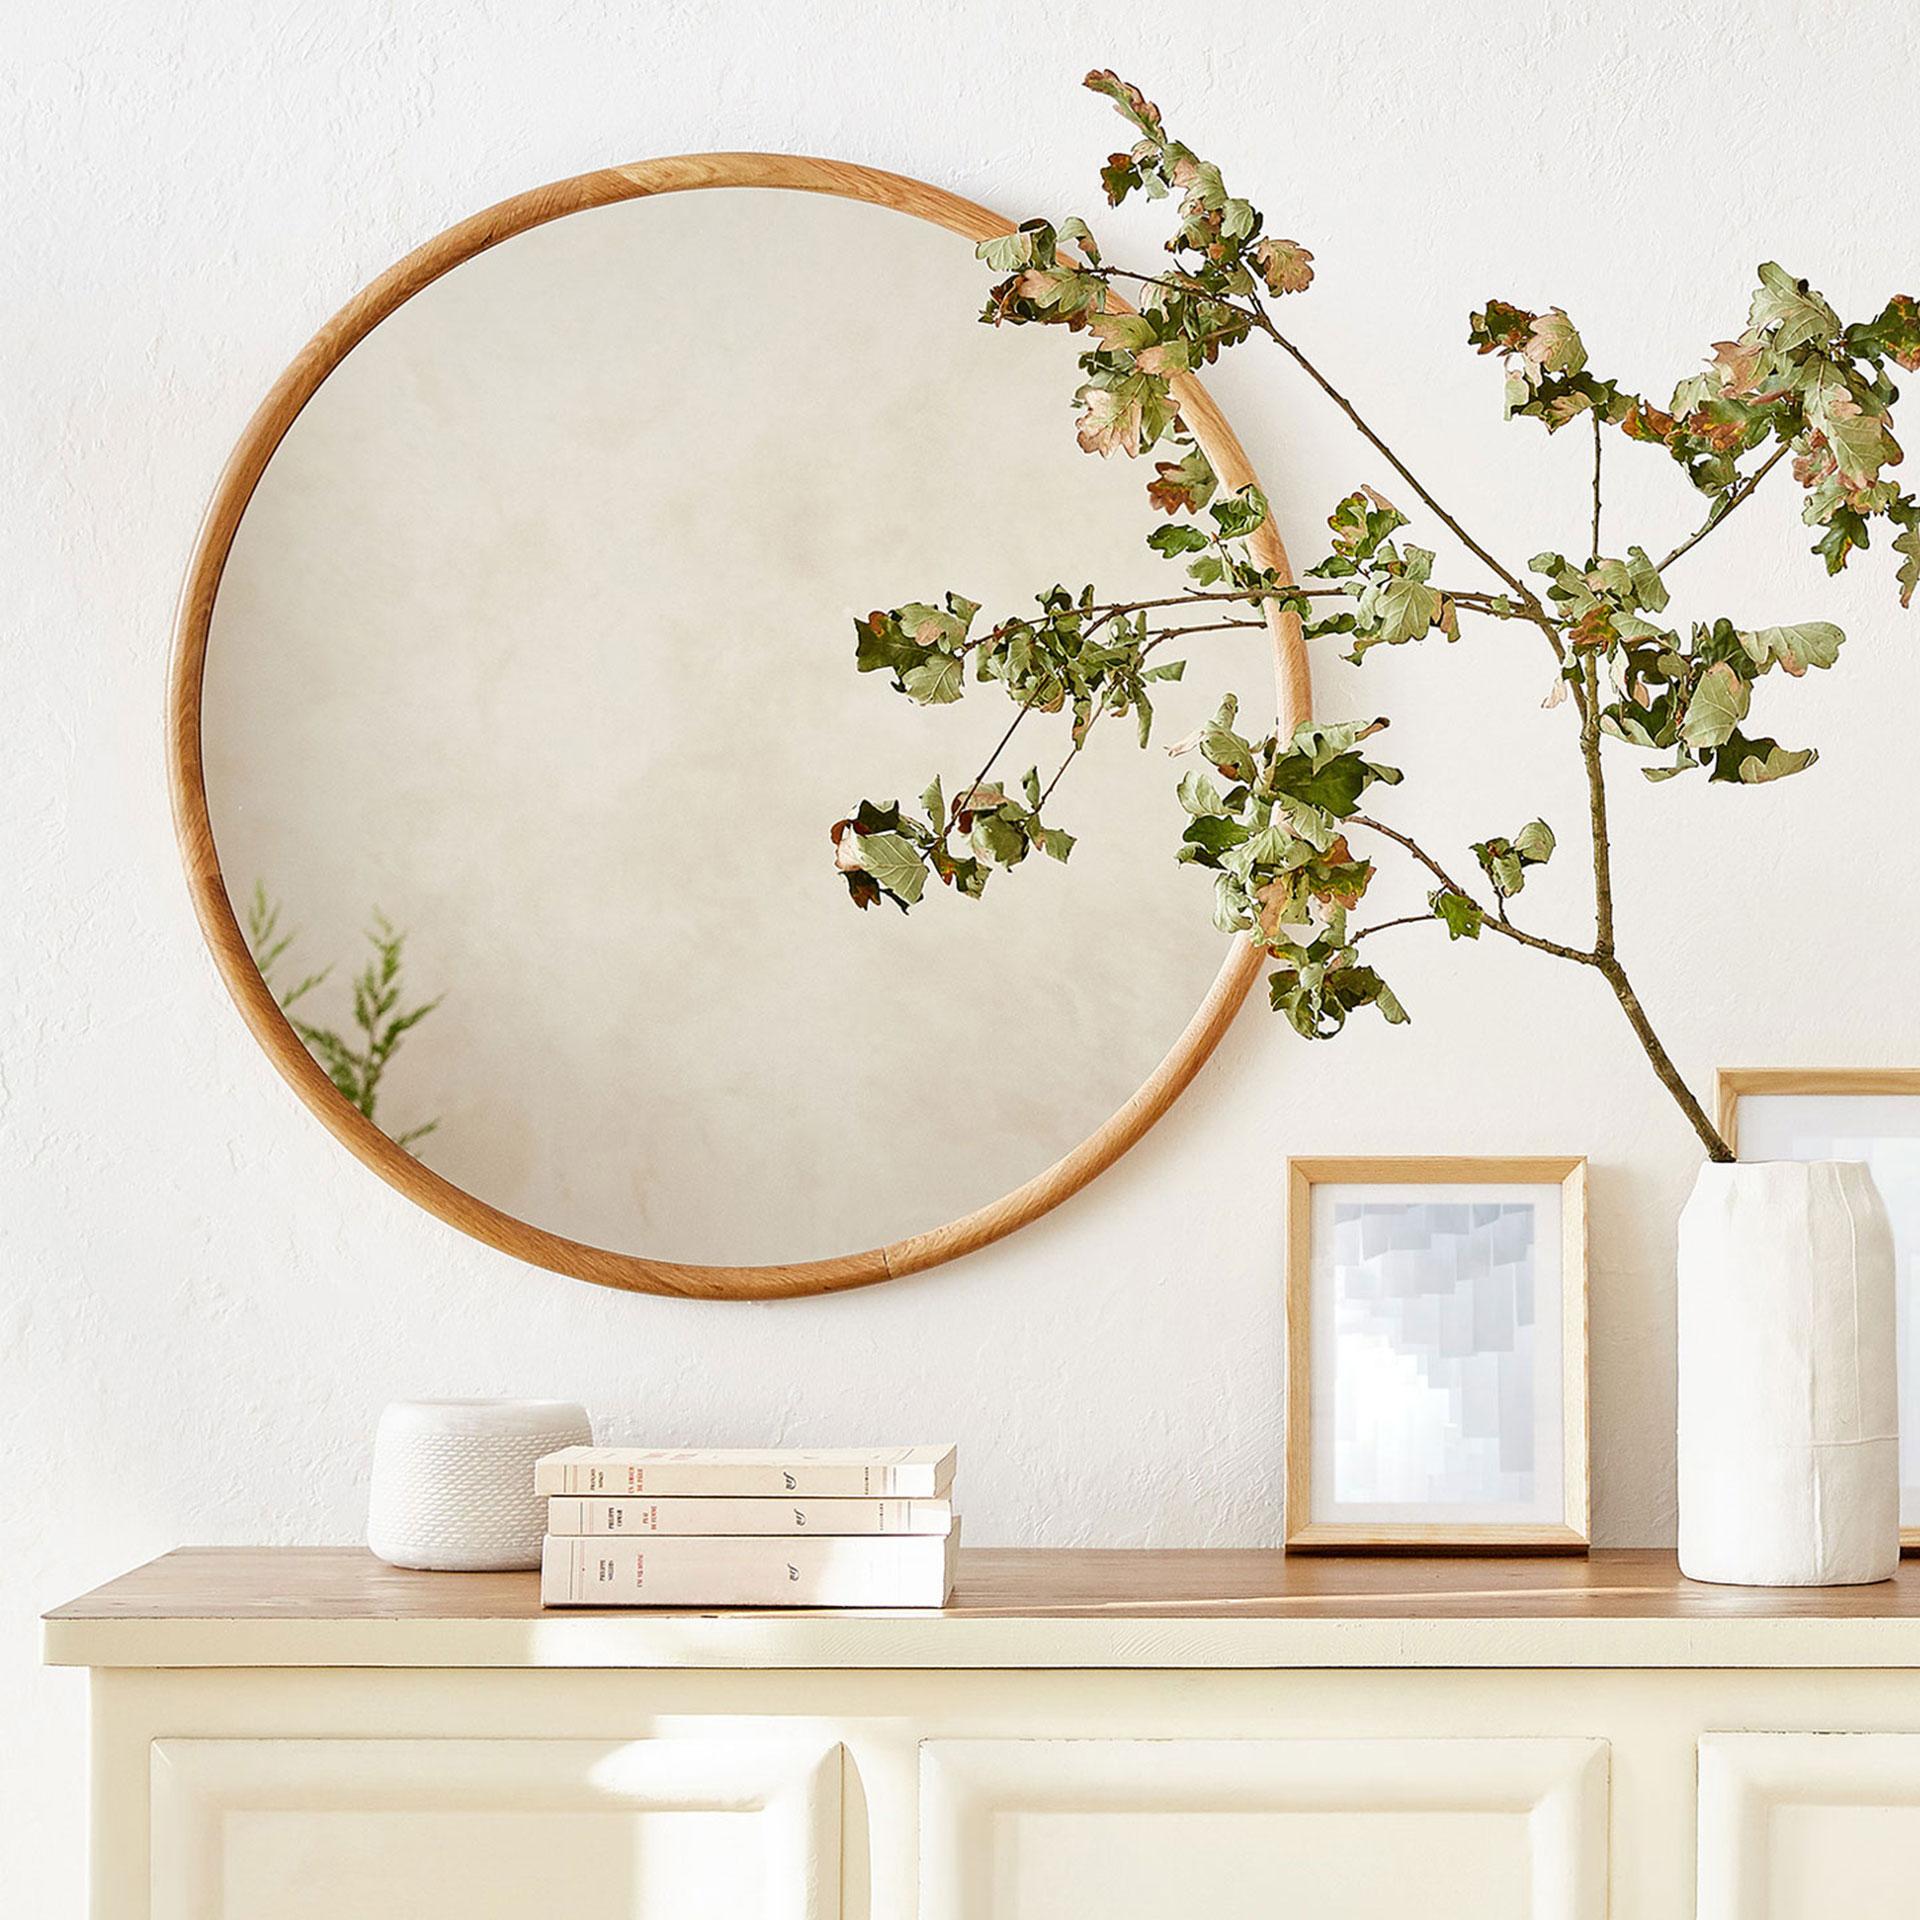 escalera toallero zara home finest free rebajas y ofertas zara home verano with zara home. Black Bedroom Furniture Sets. Home Design Ideas